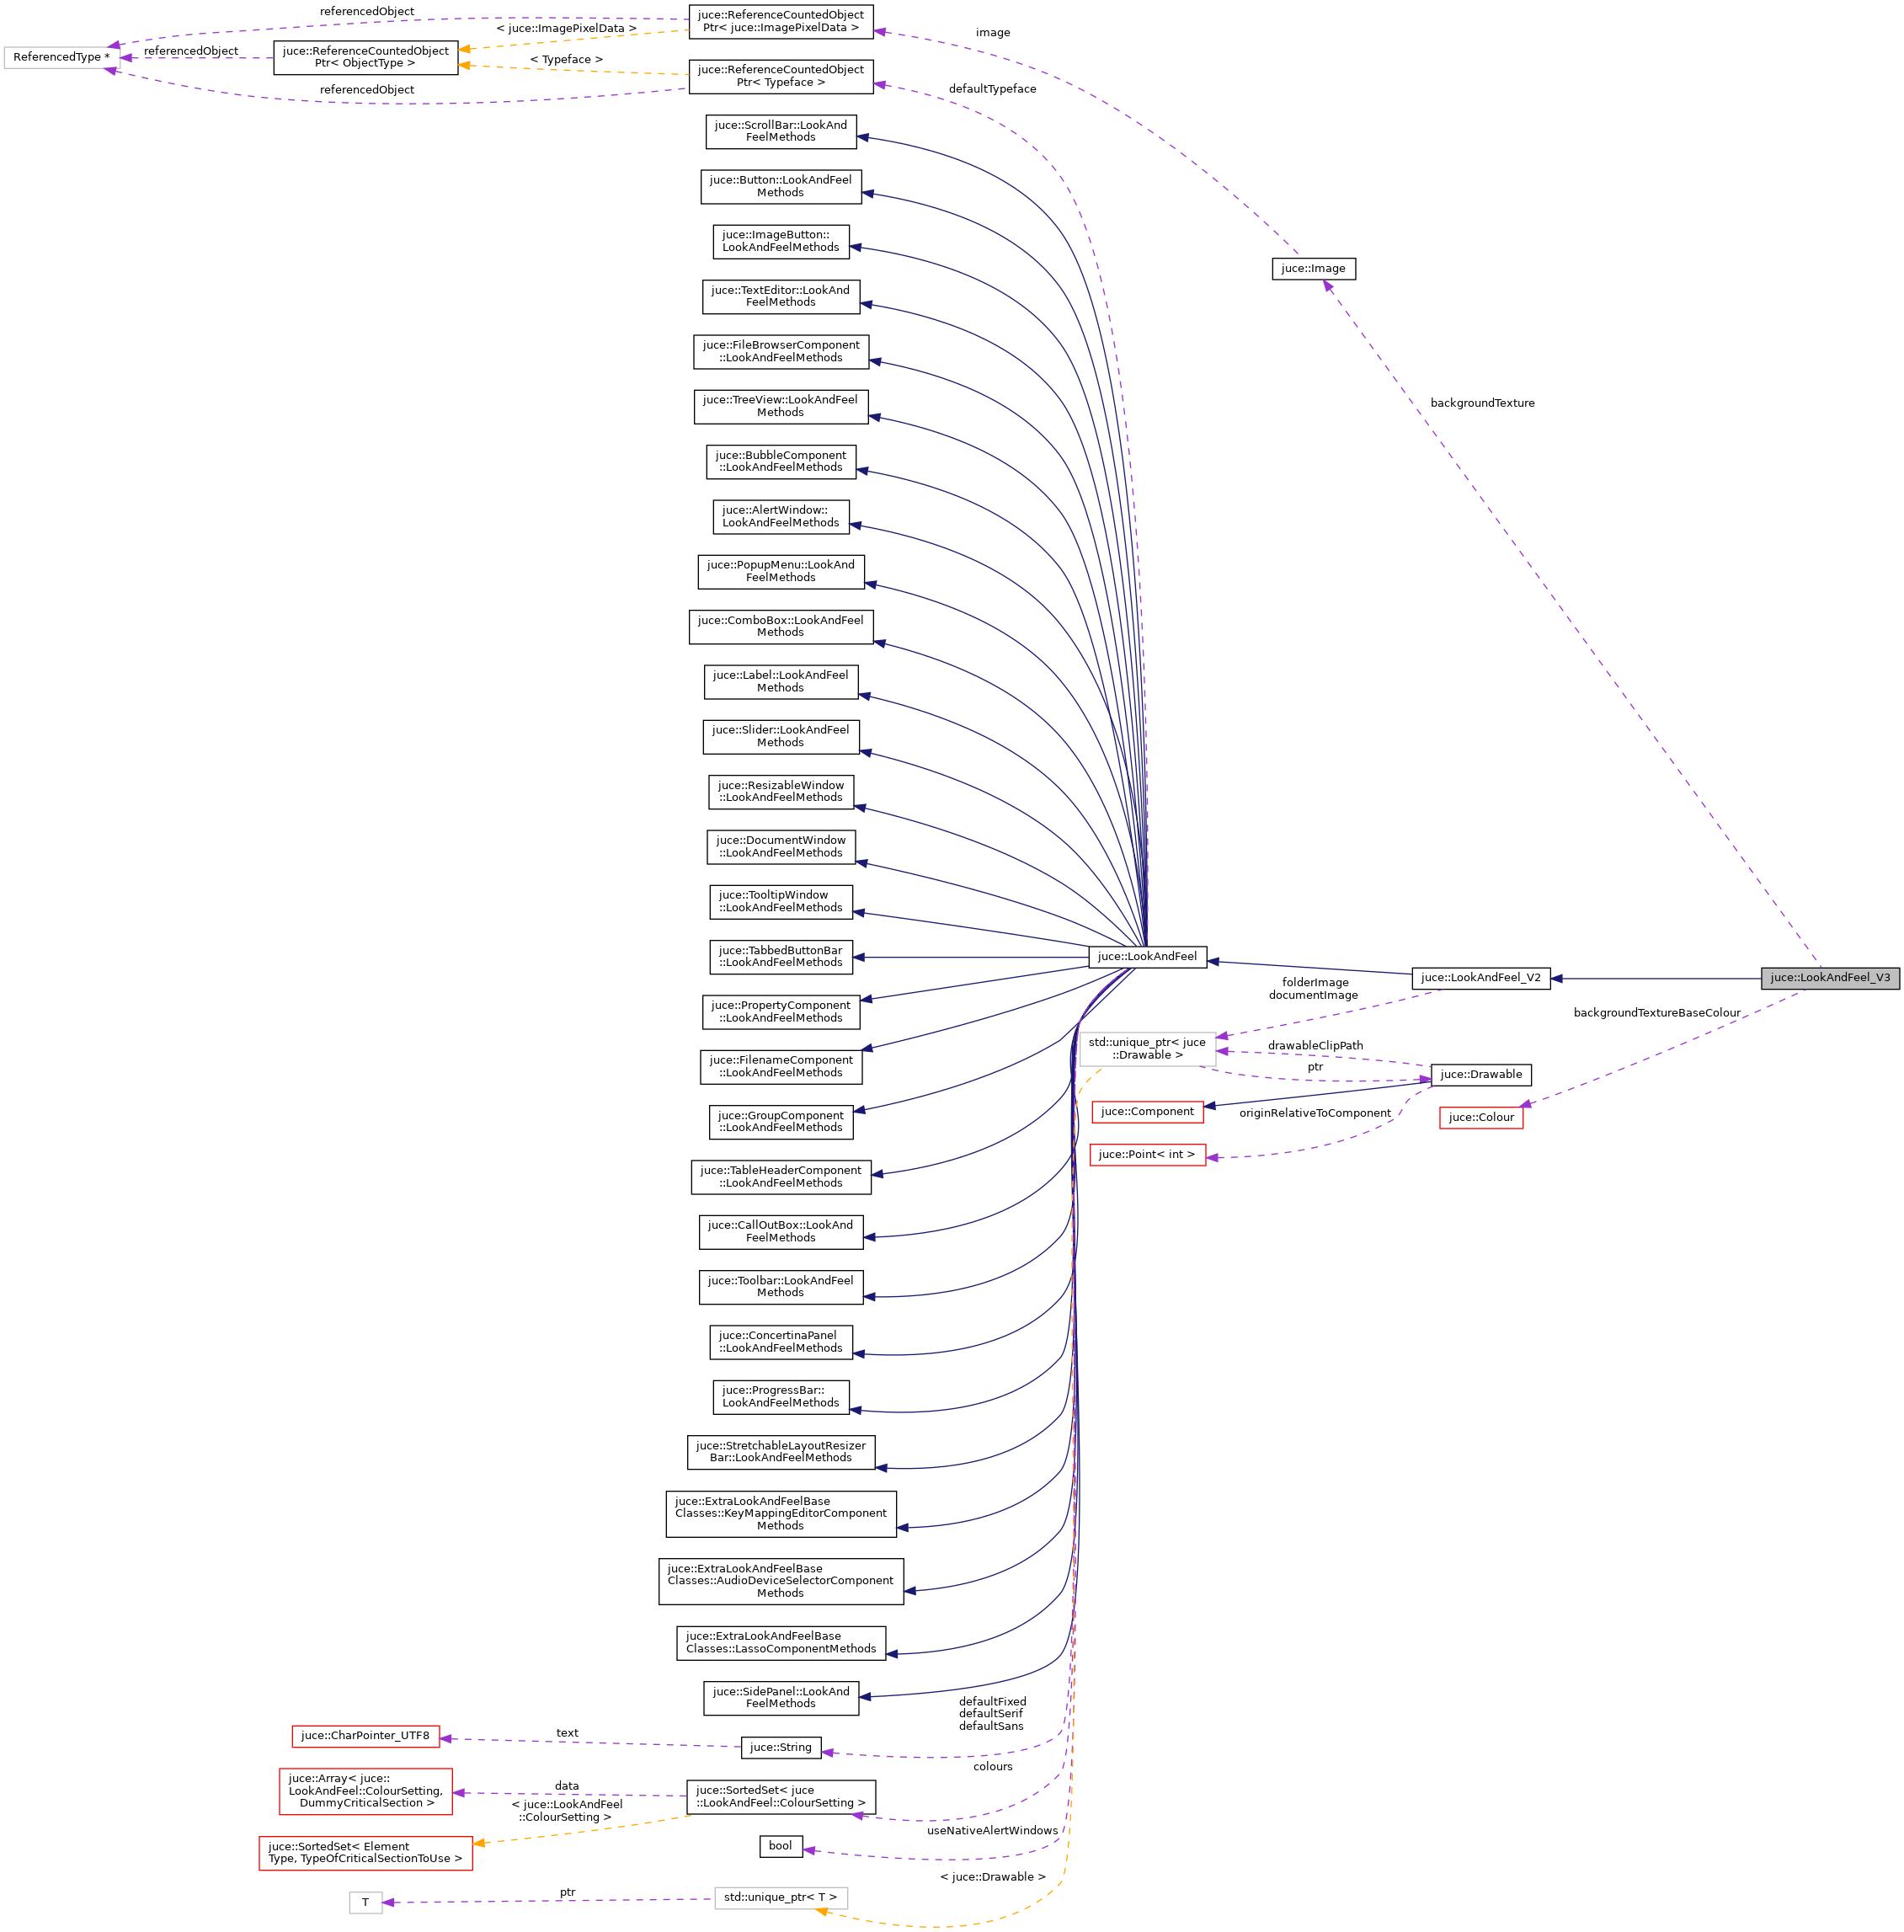 JUCE: juce::LookAndFeel_V3 Class Reference